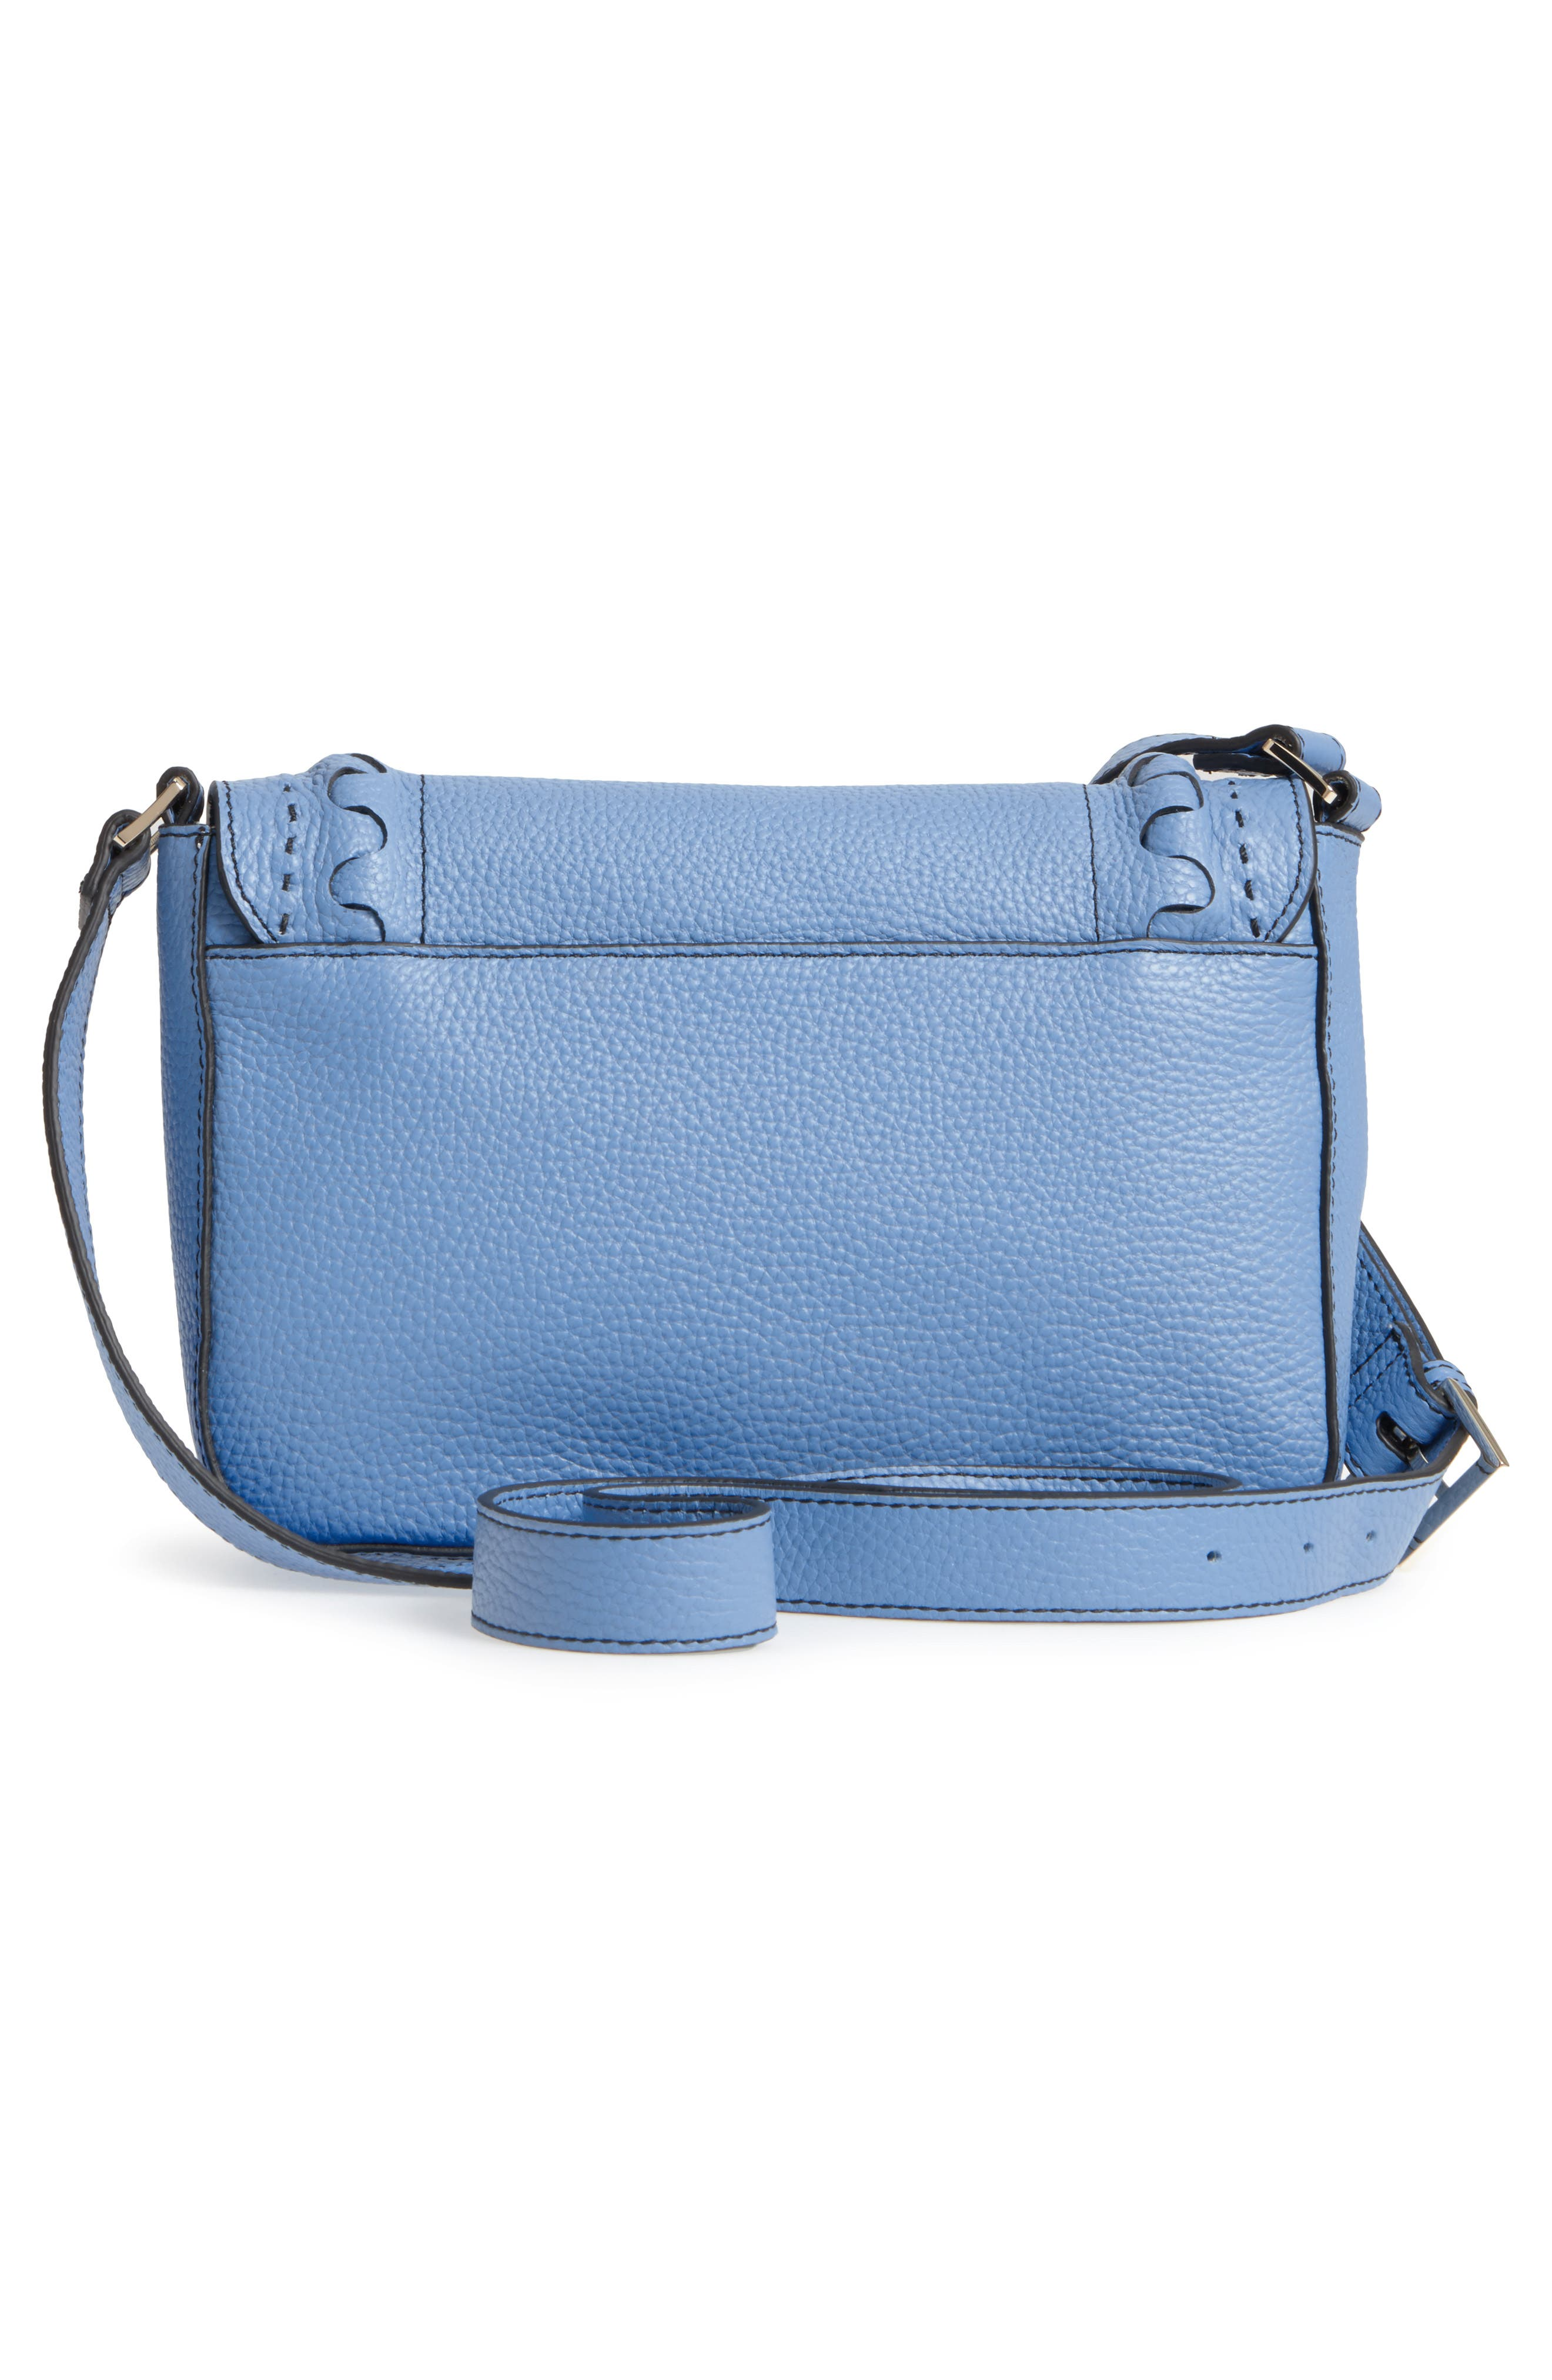 Tippi Leather Crossbody Bag,                             Alternate thumbnail 8, color,